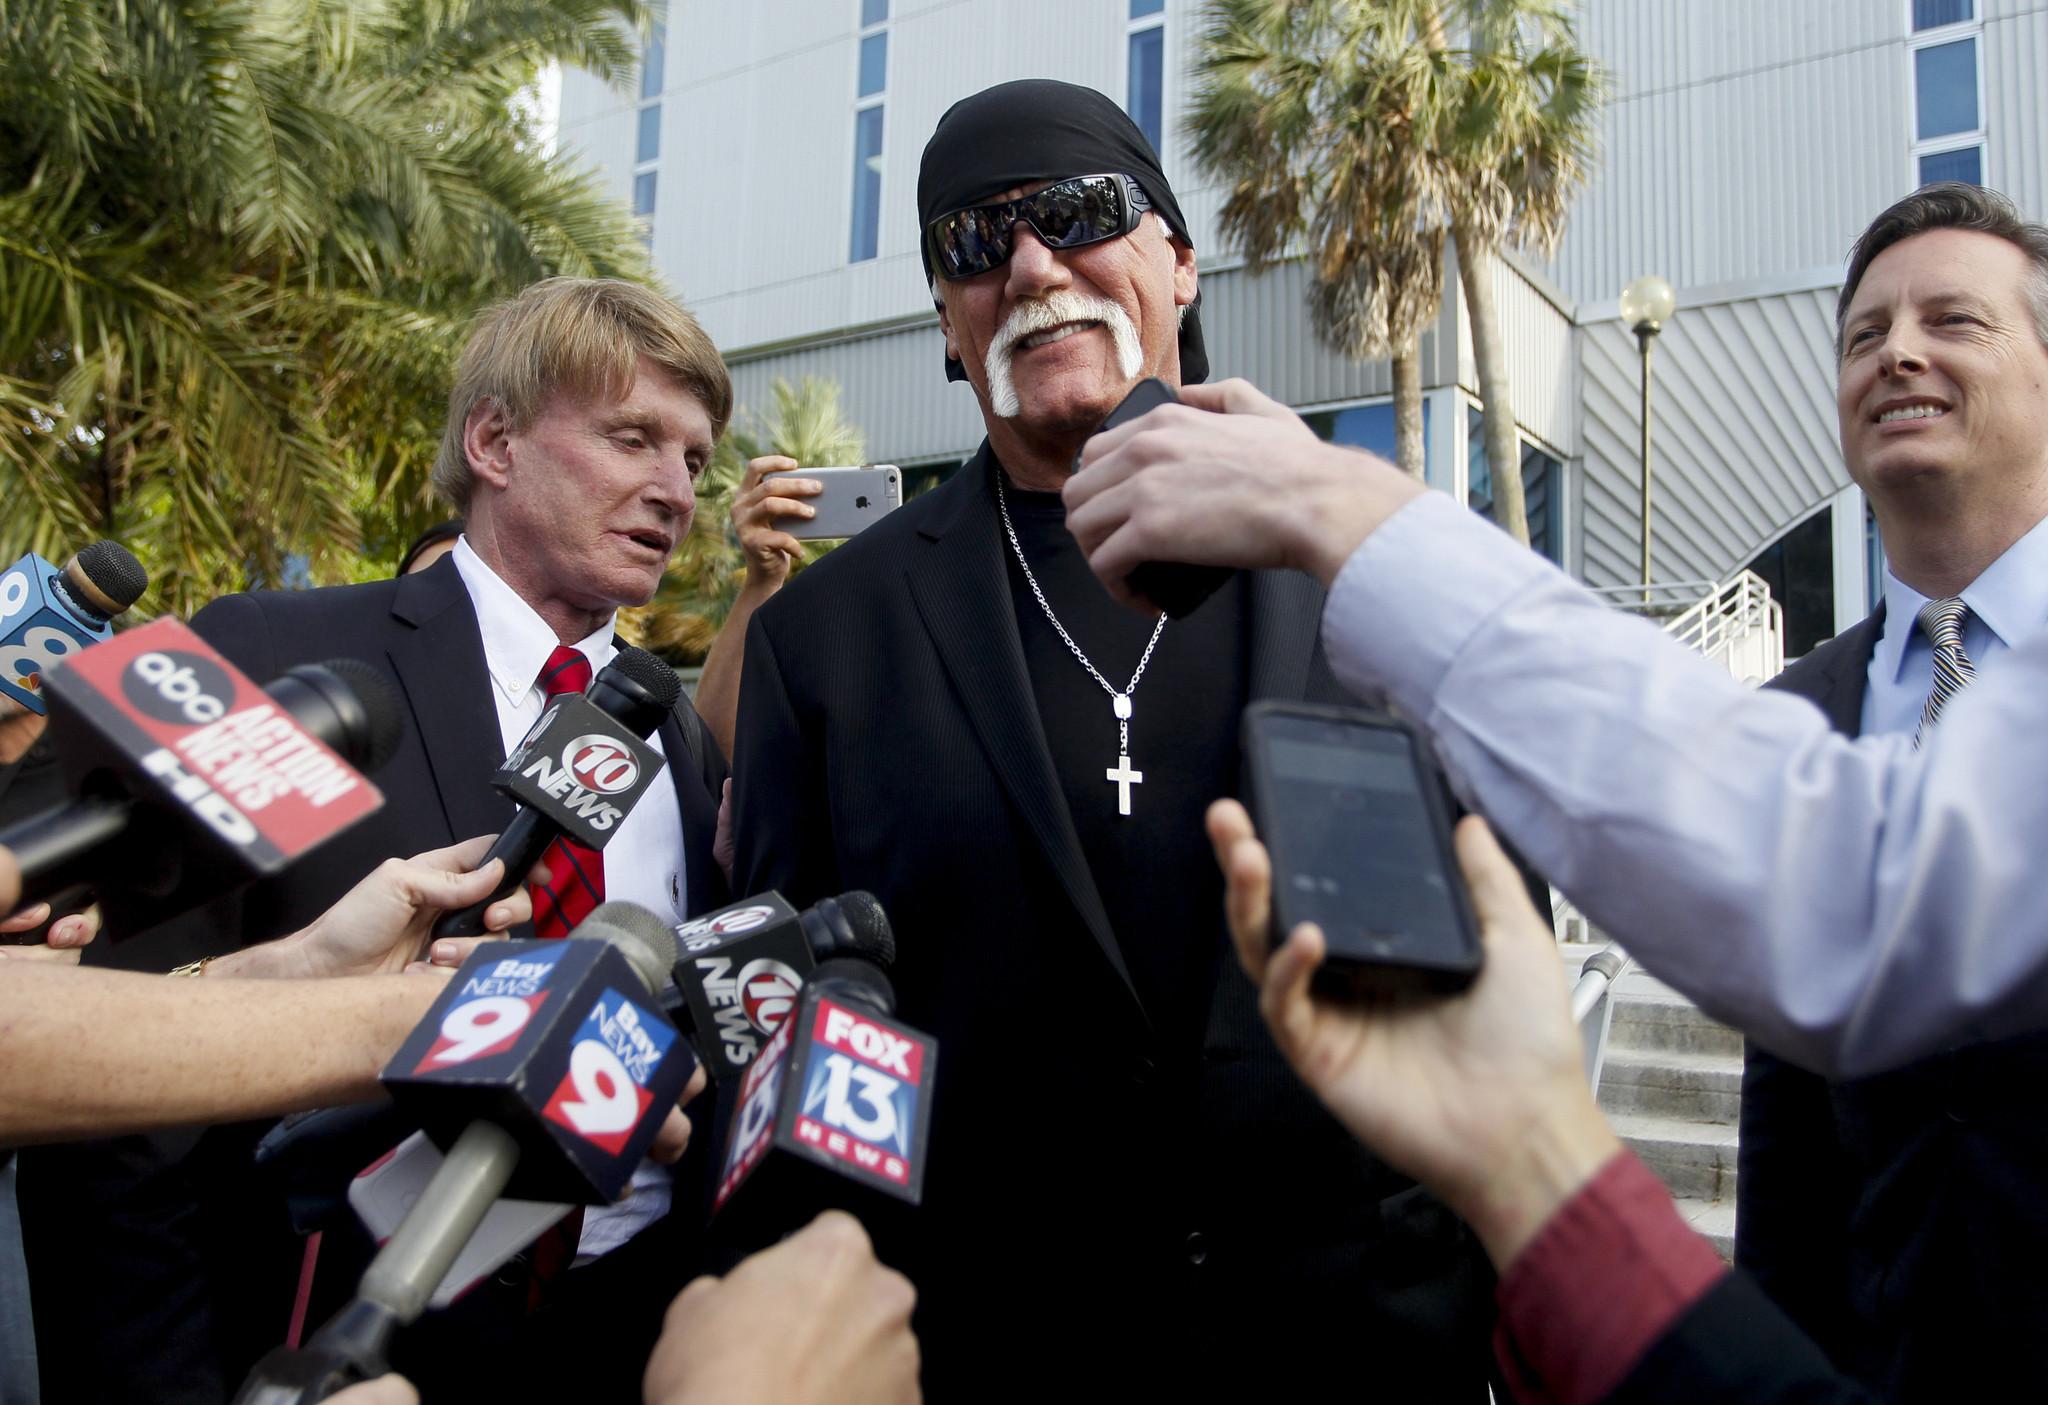 Hulk Hogan Sex Video Verdict Could Have Limited Impact